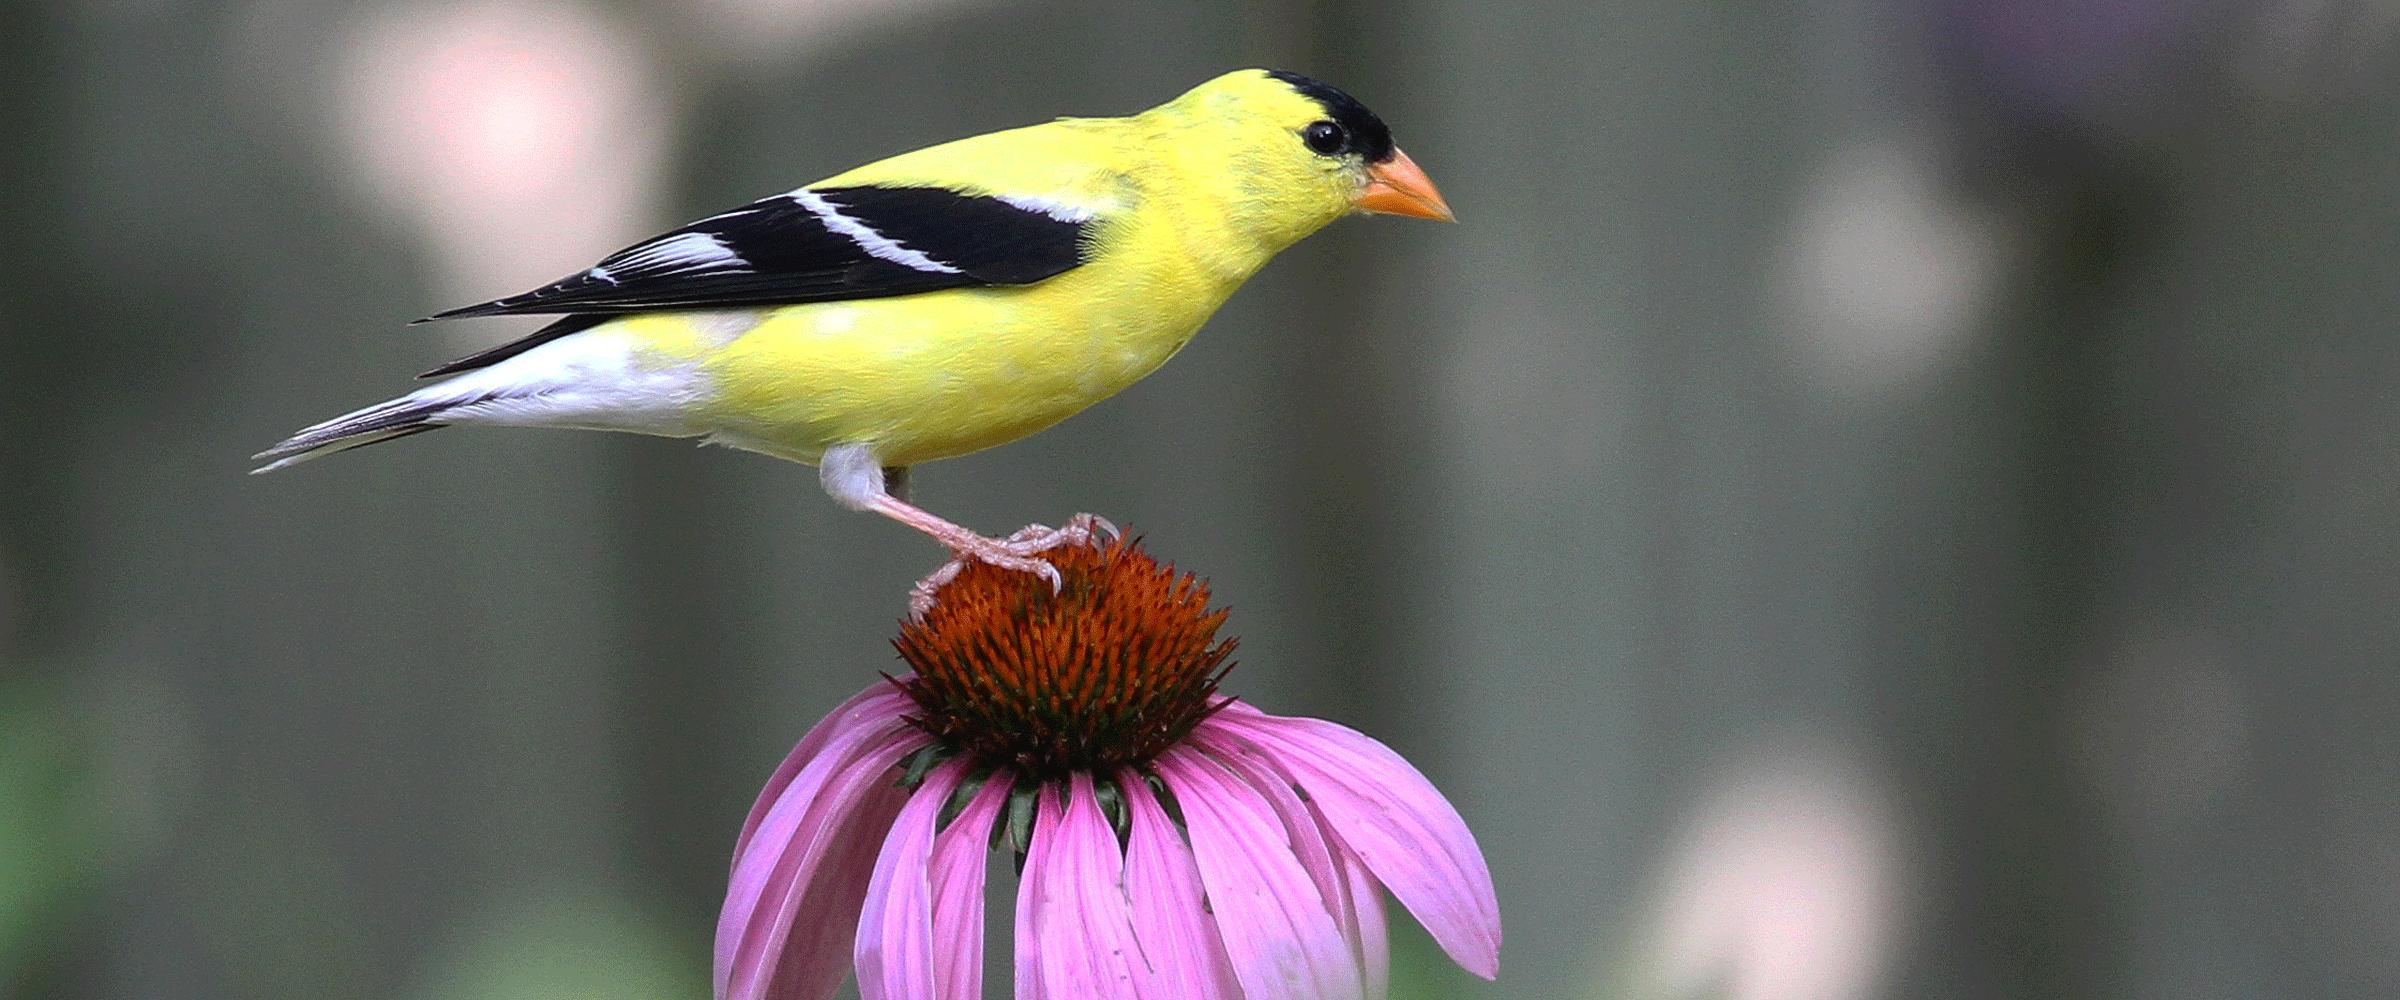 bird friendly communities audubon north carolina